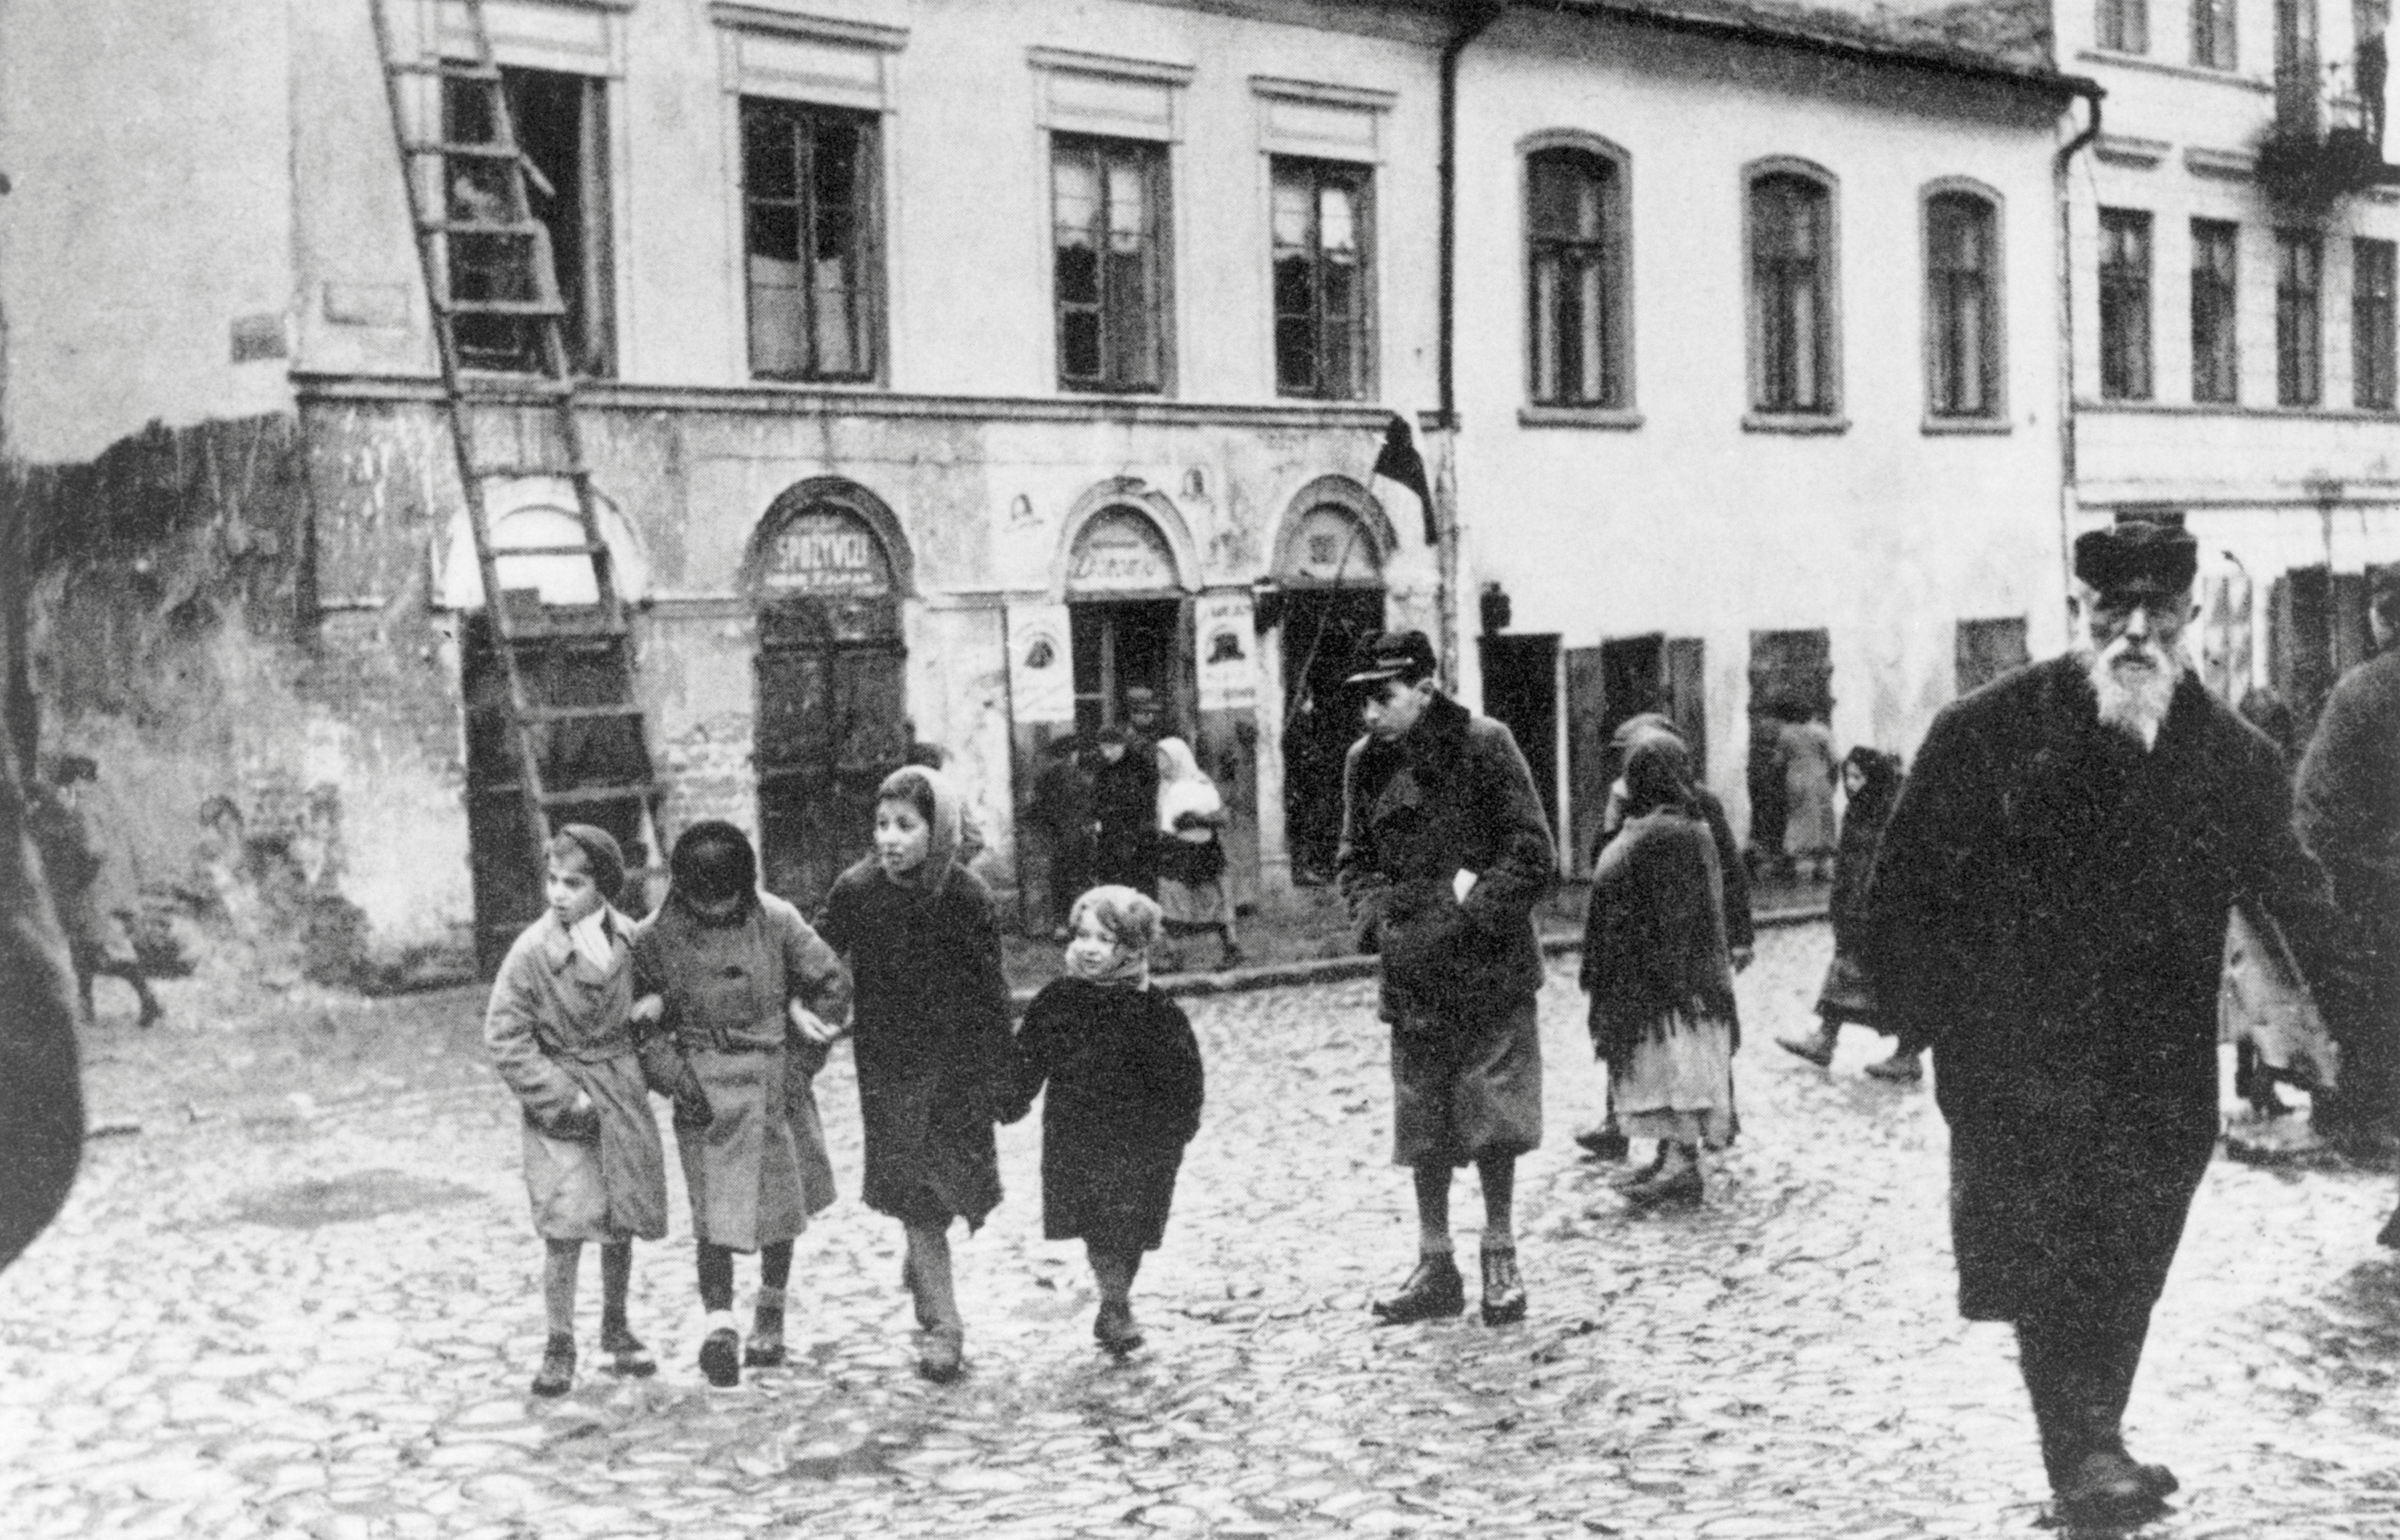 Lublin Ghetto in Poland